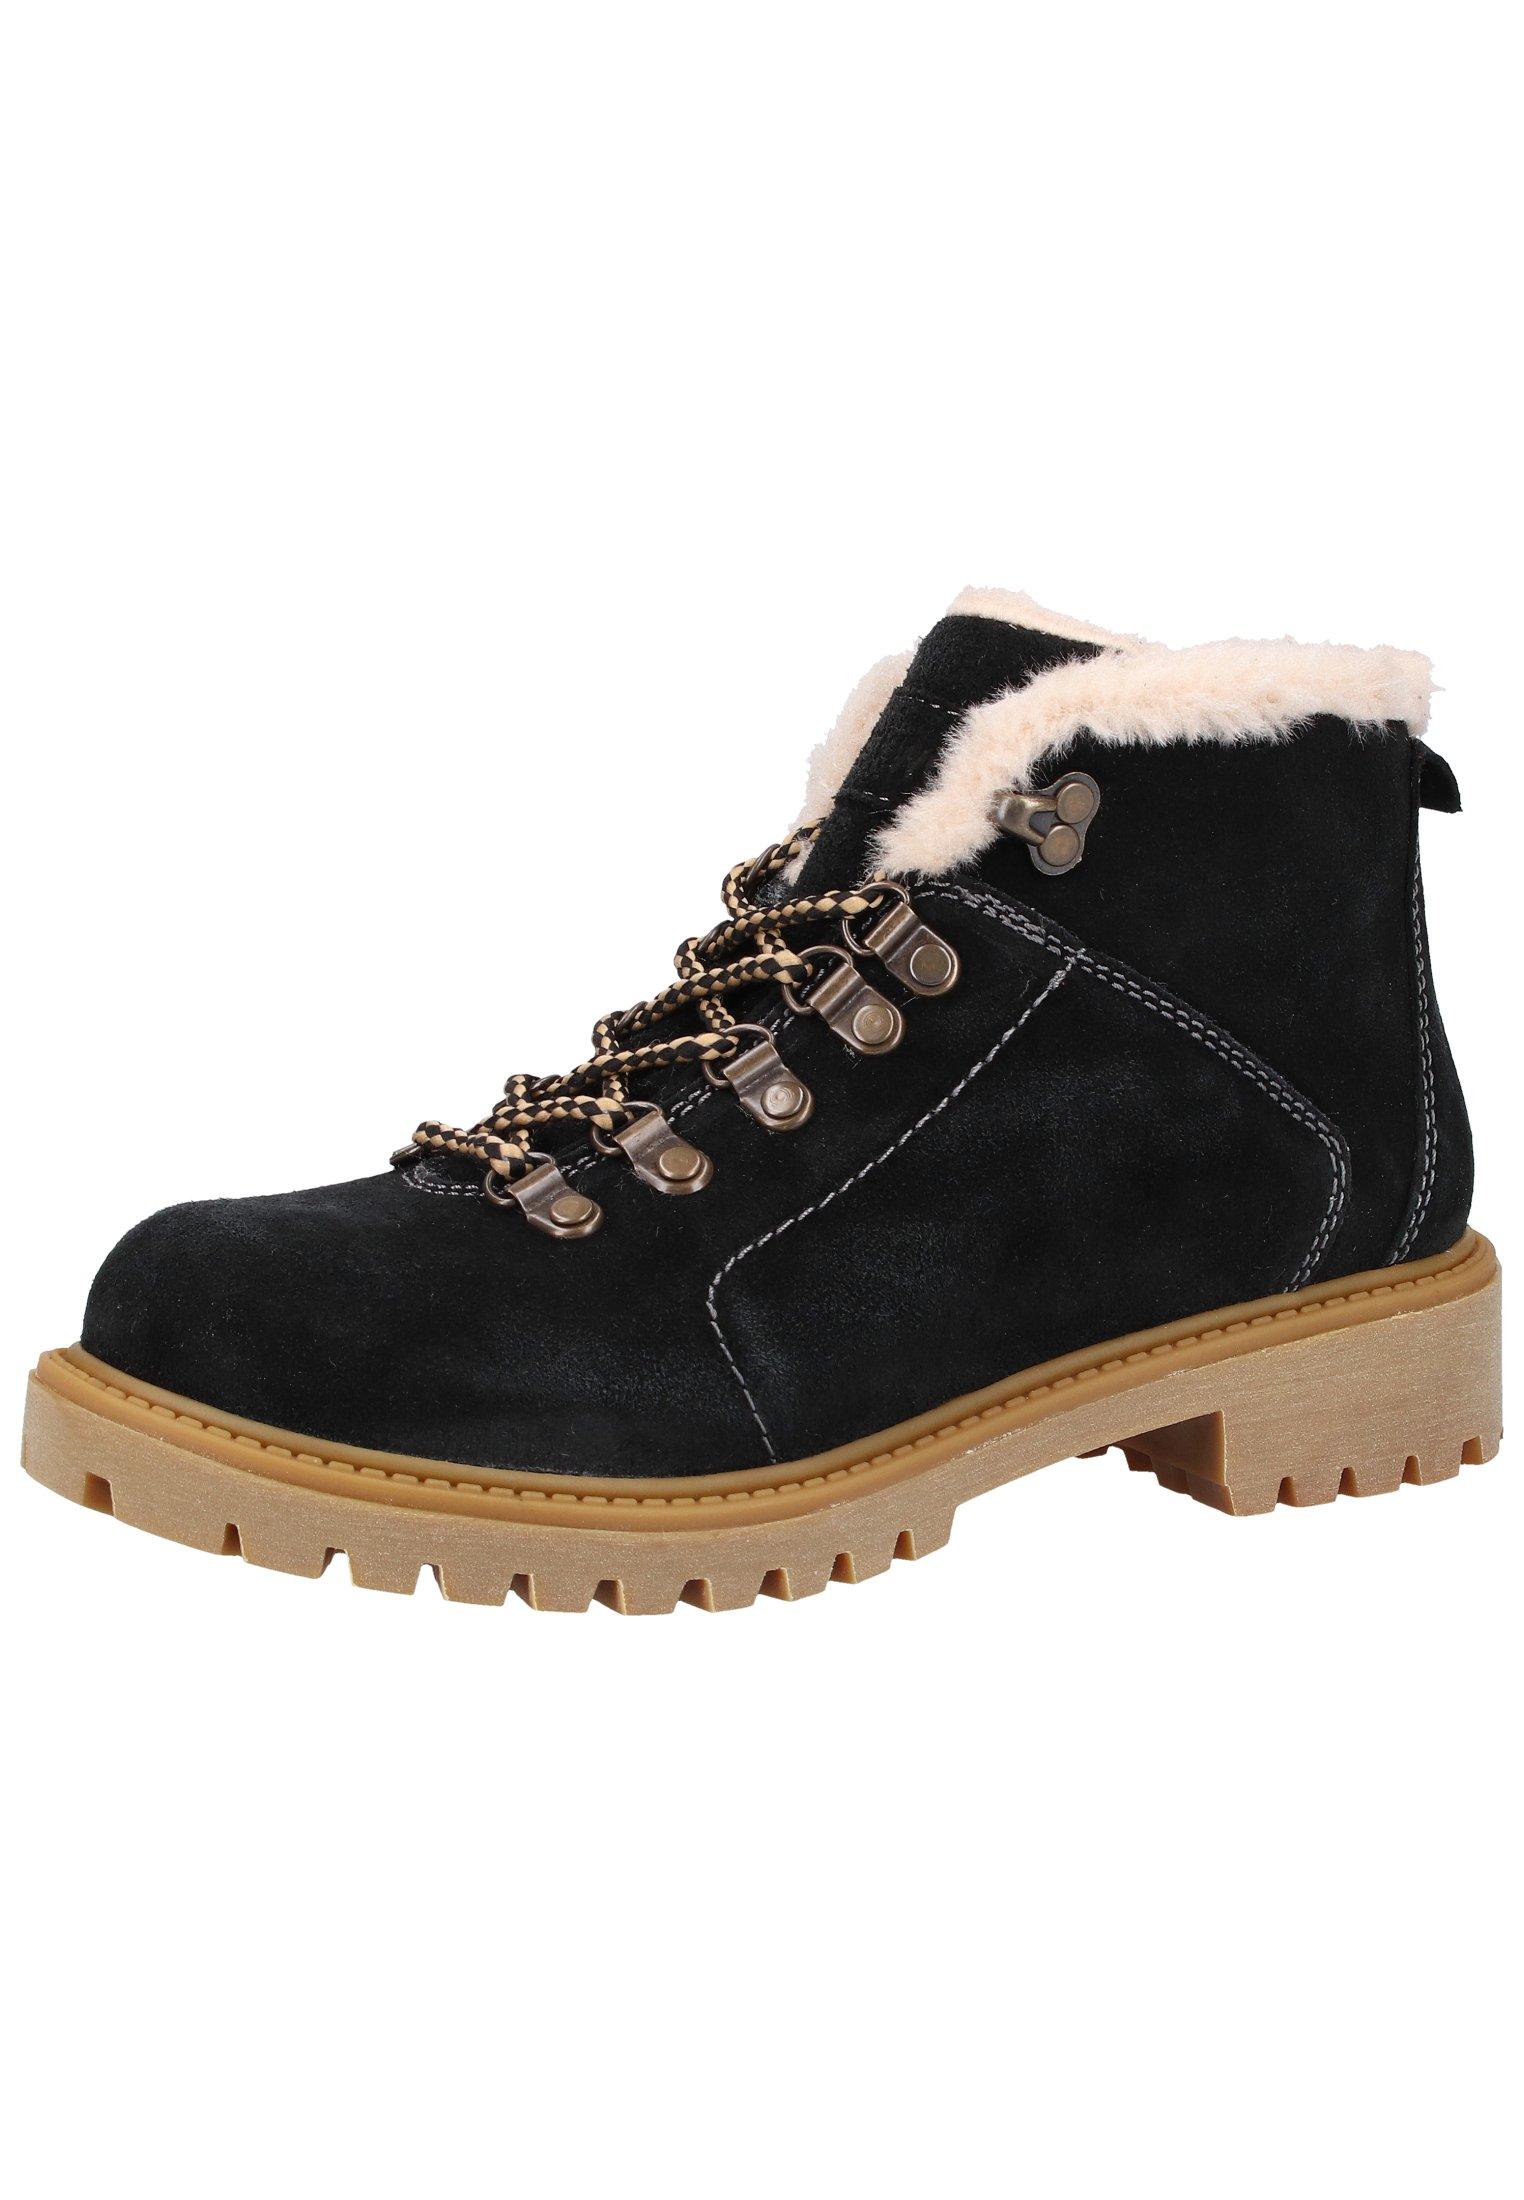 Darkwood Ankle Boot - black - Black Friday